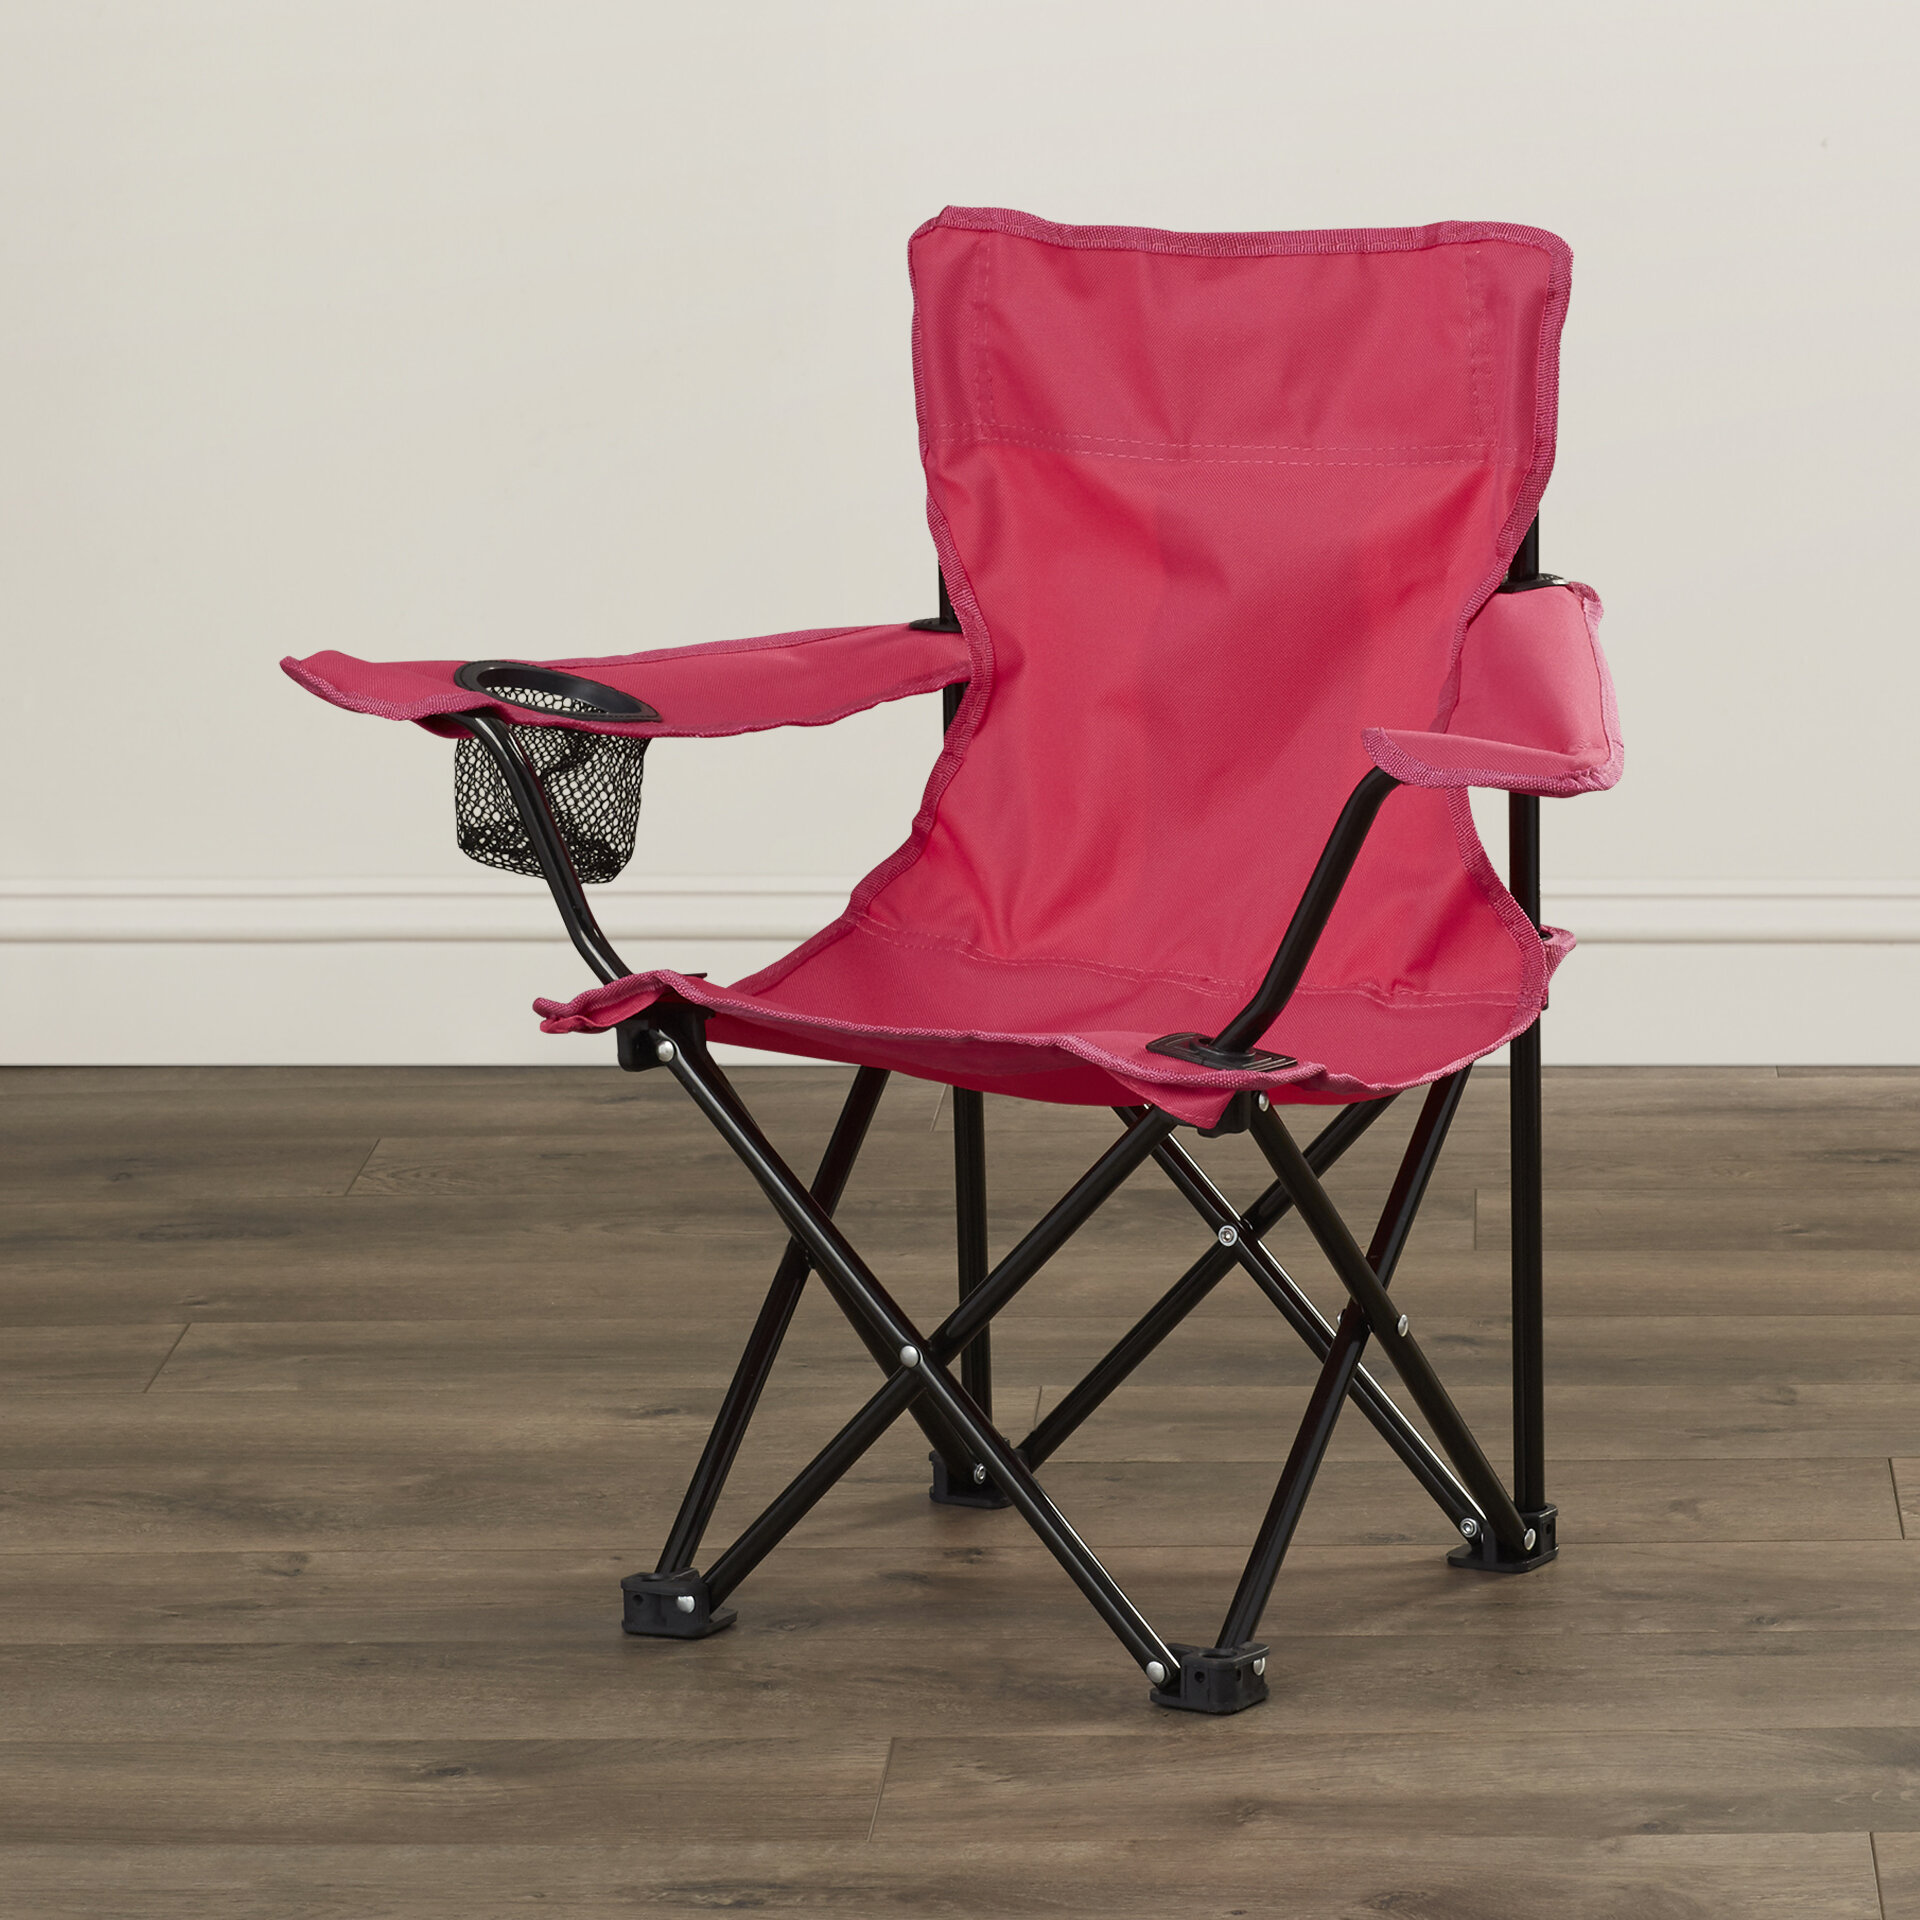 Zoomie Kids Randy Folding Kids Camping Chair With Cup Holder U0026 Reviews |  Wayfair